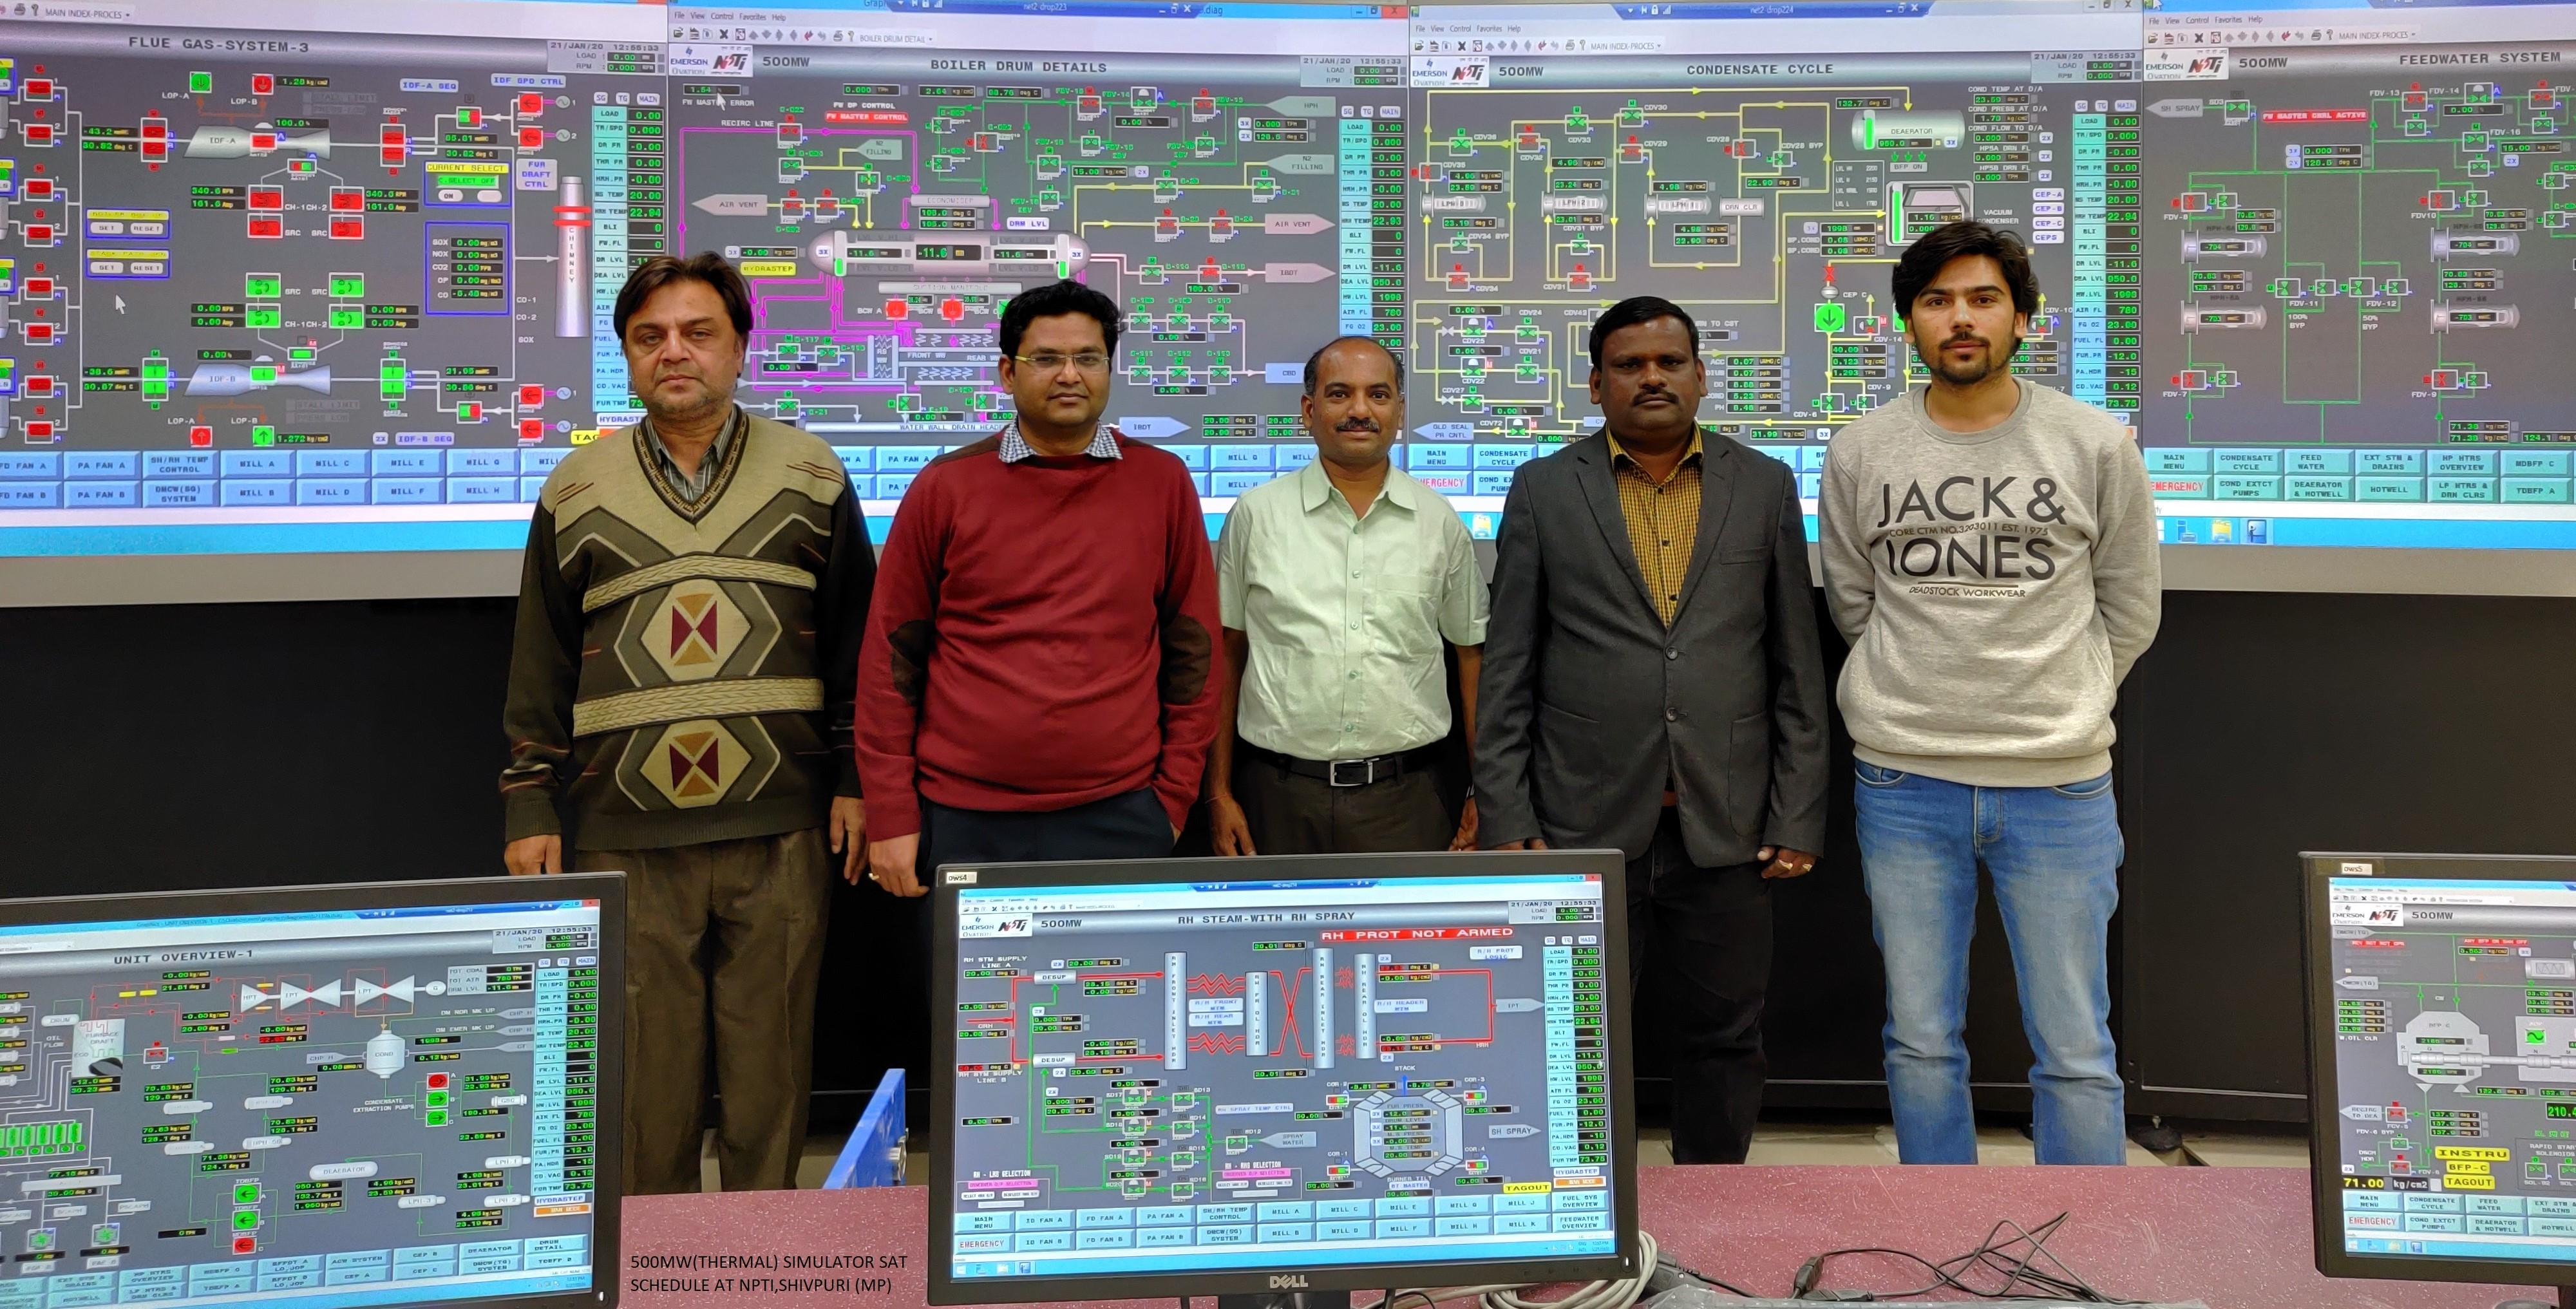 http://npti.gov.in/npti_shivpuri/sites/npti-shivpuri.com/files/banner_image/1_0.jpg